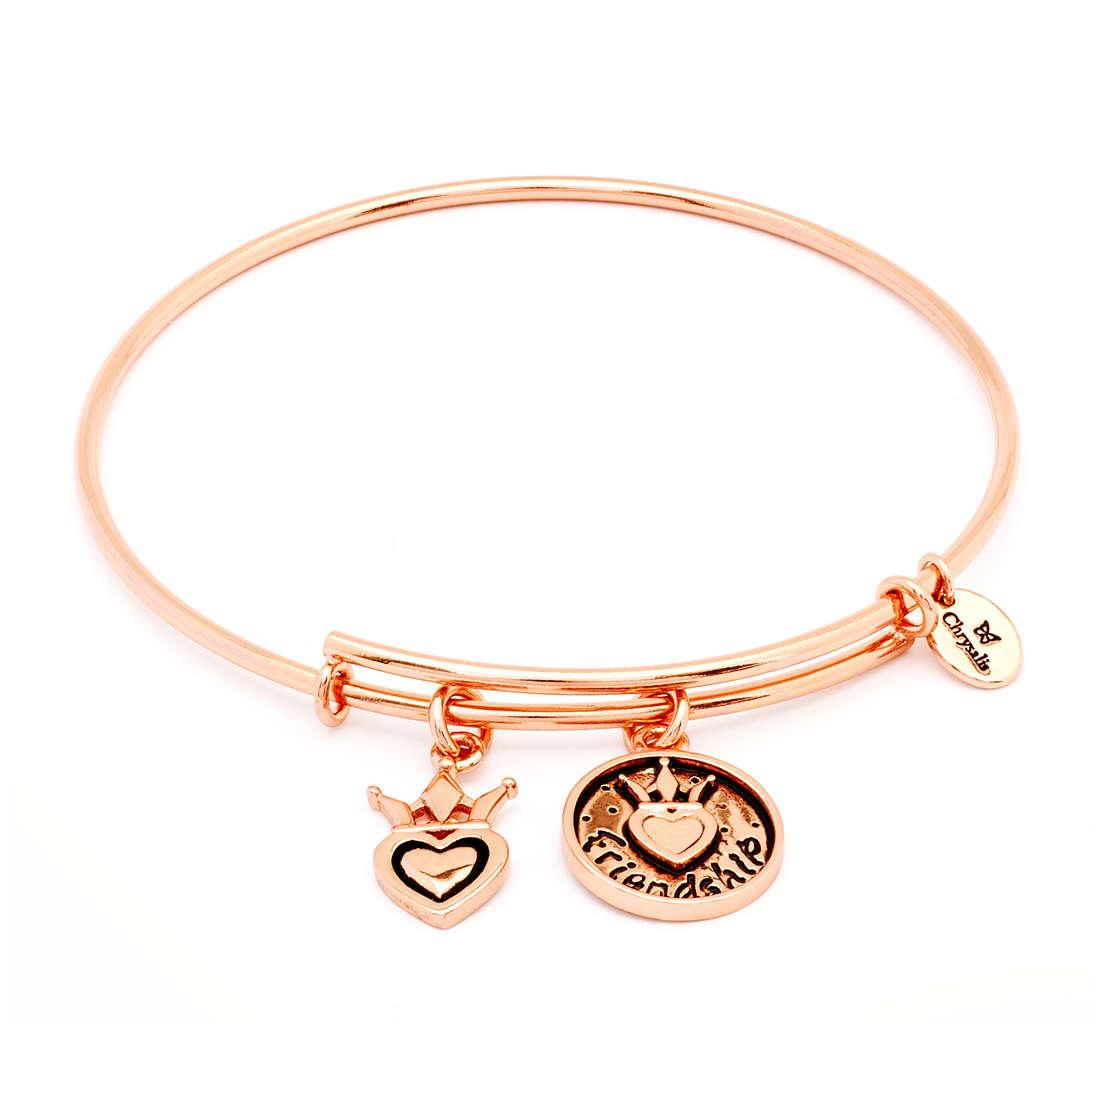 bracelet woman jewellery Chrysalis CRBT0704RG